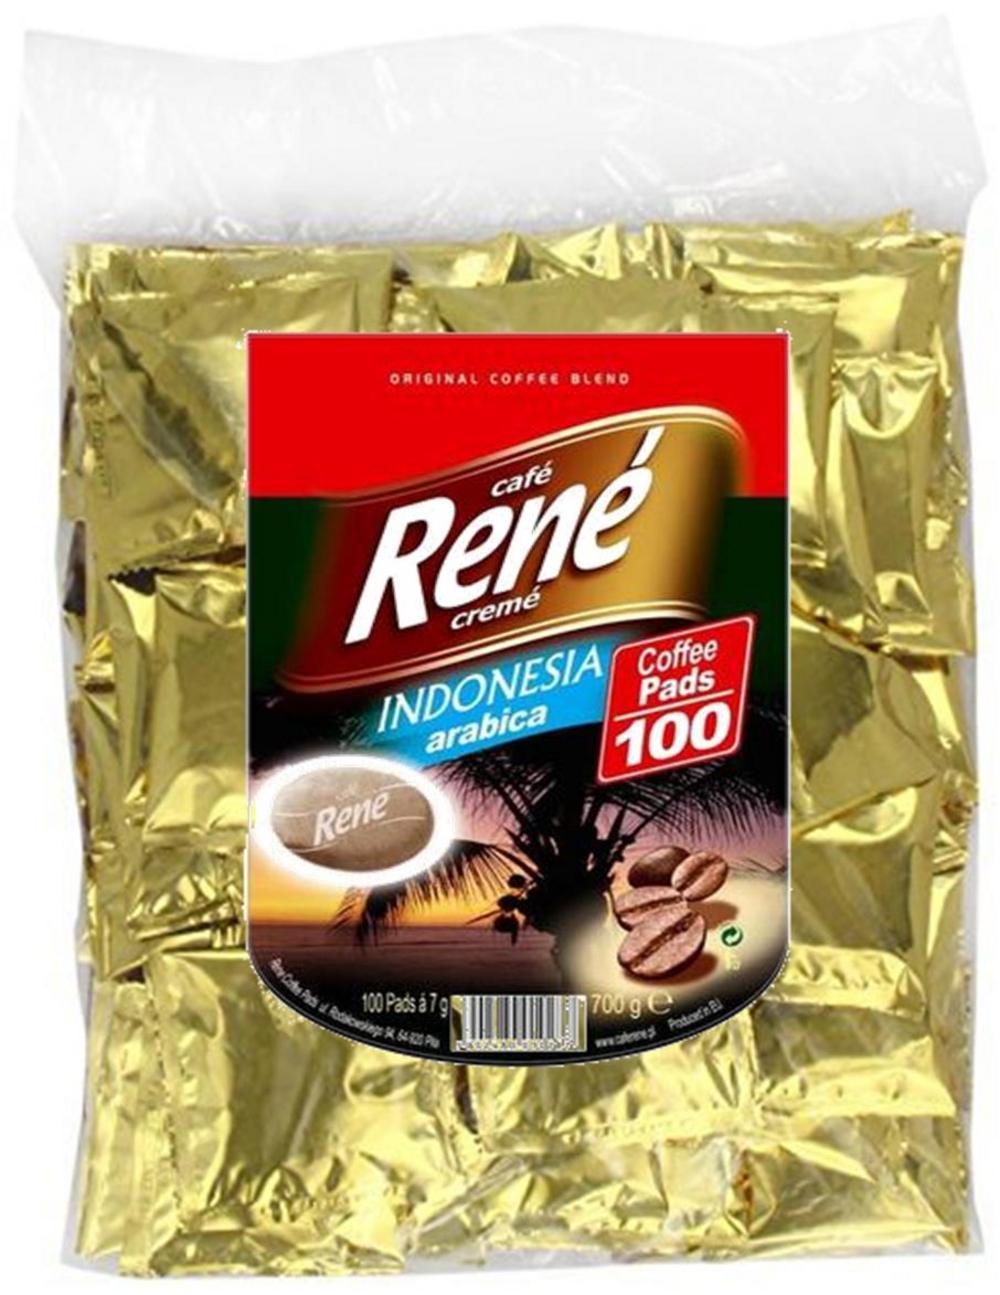 Philips Senseo 100 x Café Rene Crème Indonesia Java 100% Arabica Coffee Pads Bags